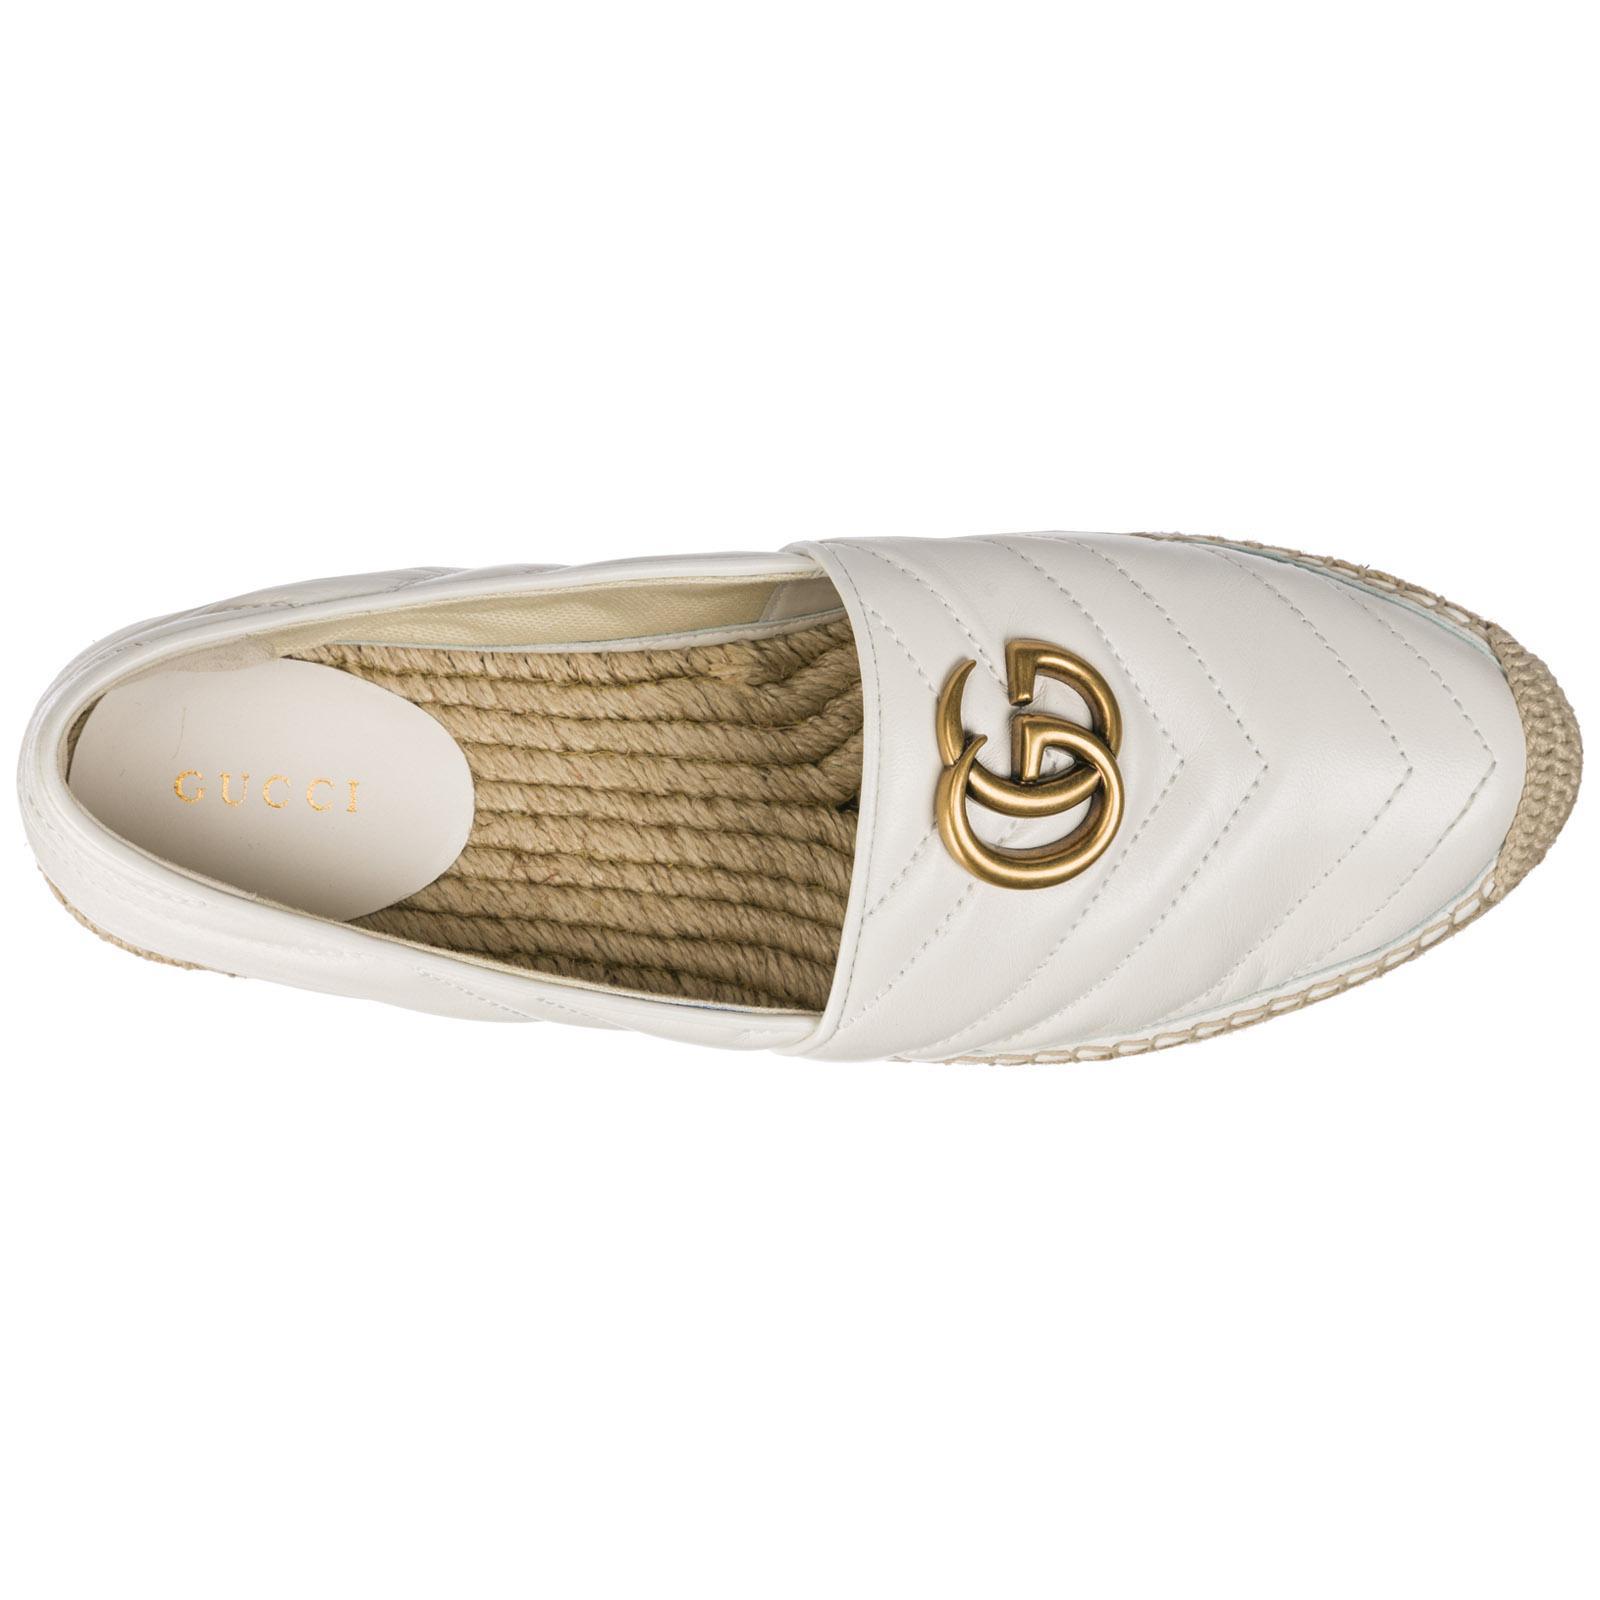 d6acfb49c2e Gucci - White Espadrilles Slip On Shoes - Lyst. View fullscreen